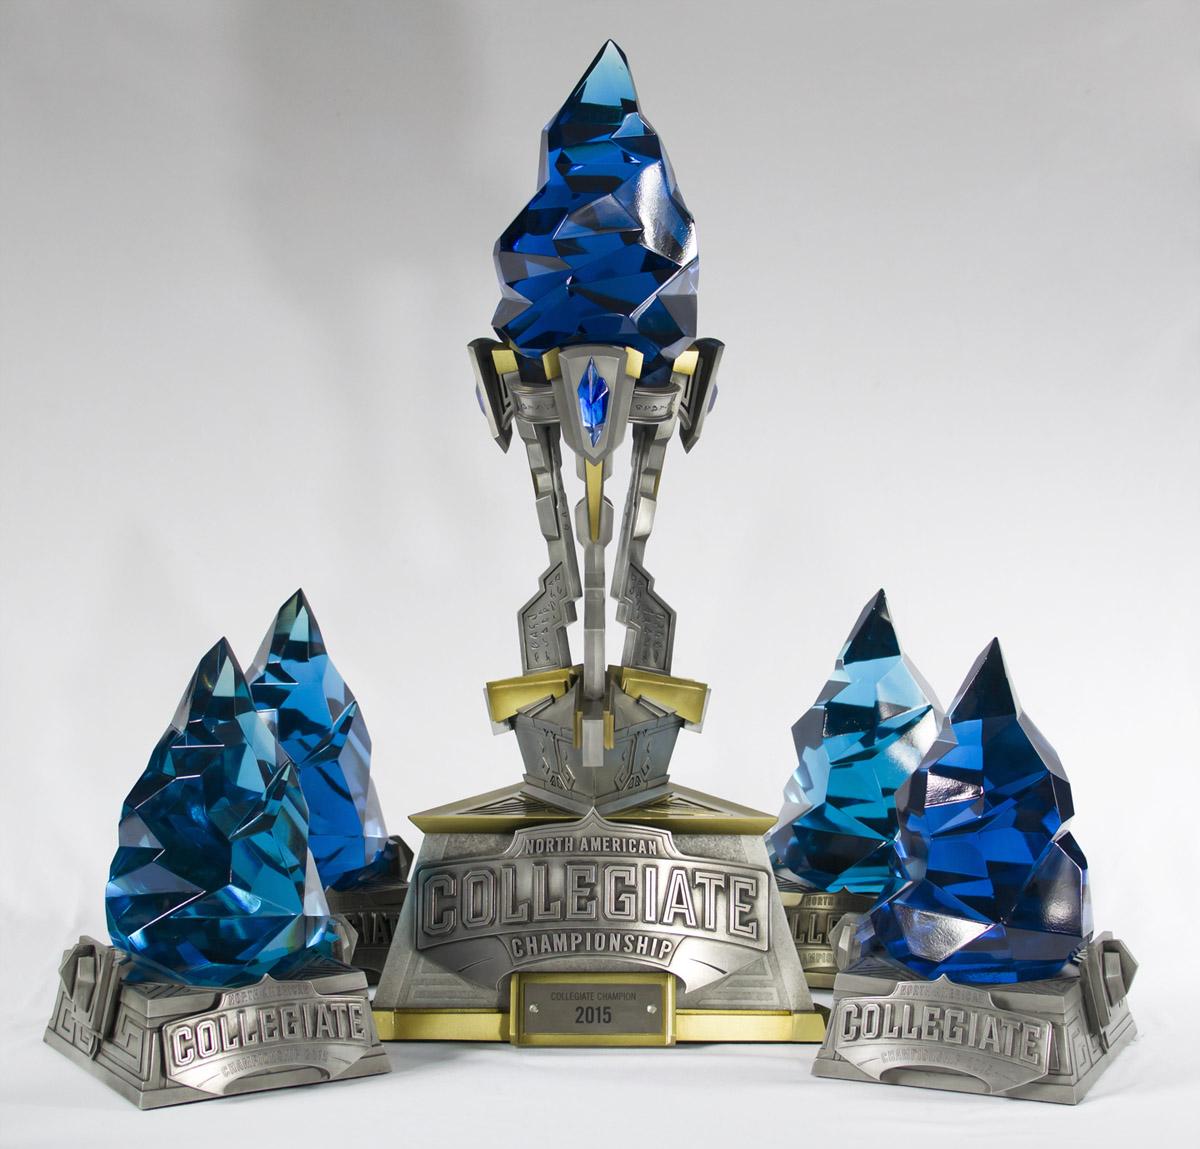 NA Colegiate Championship Trophies